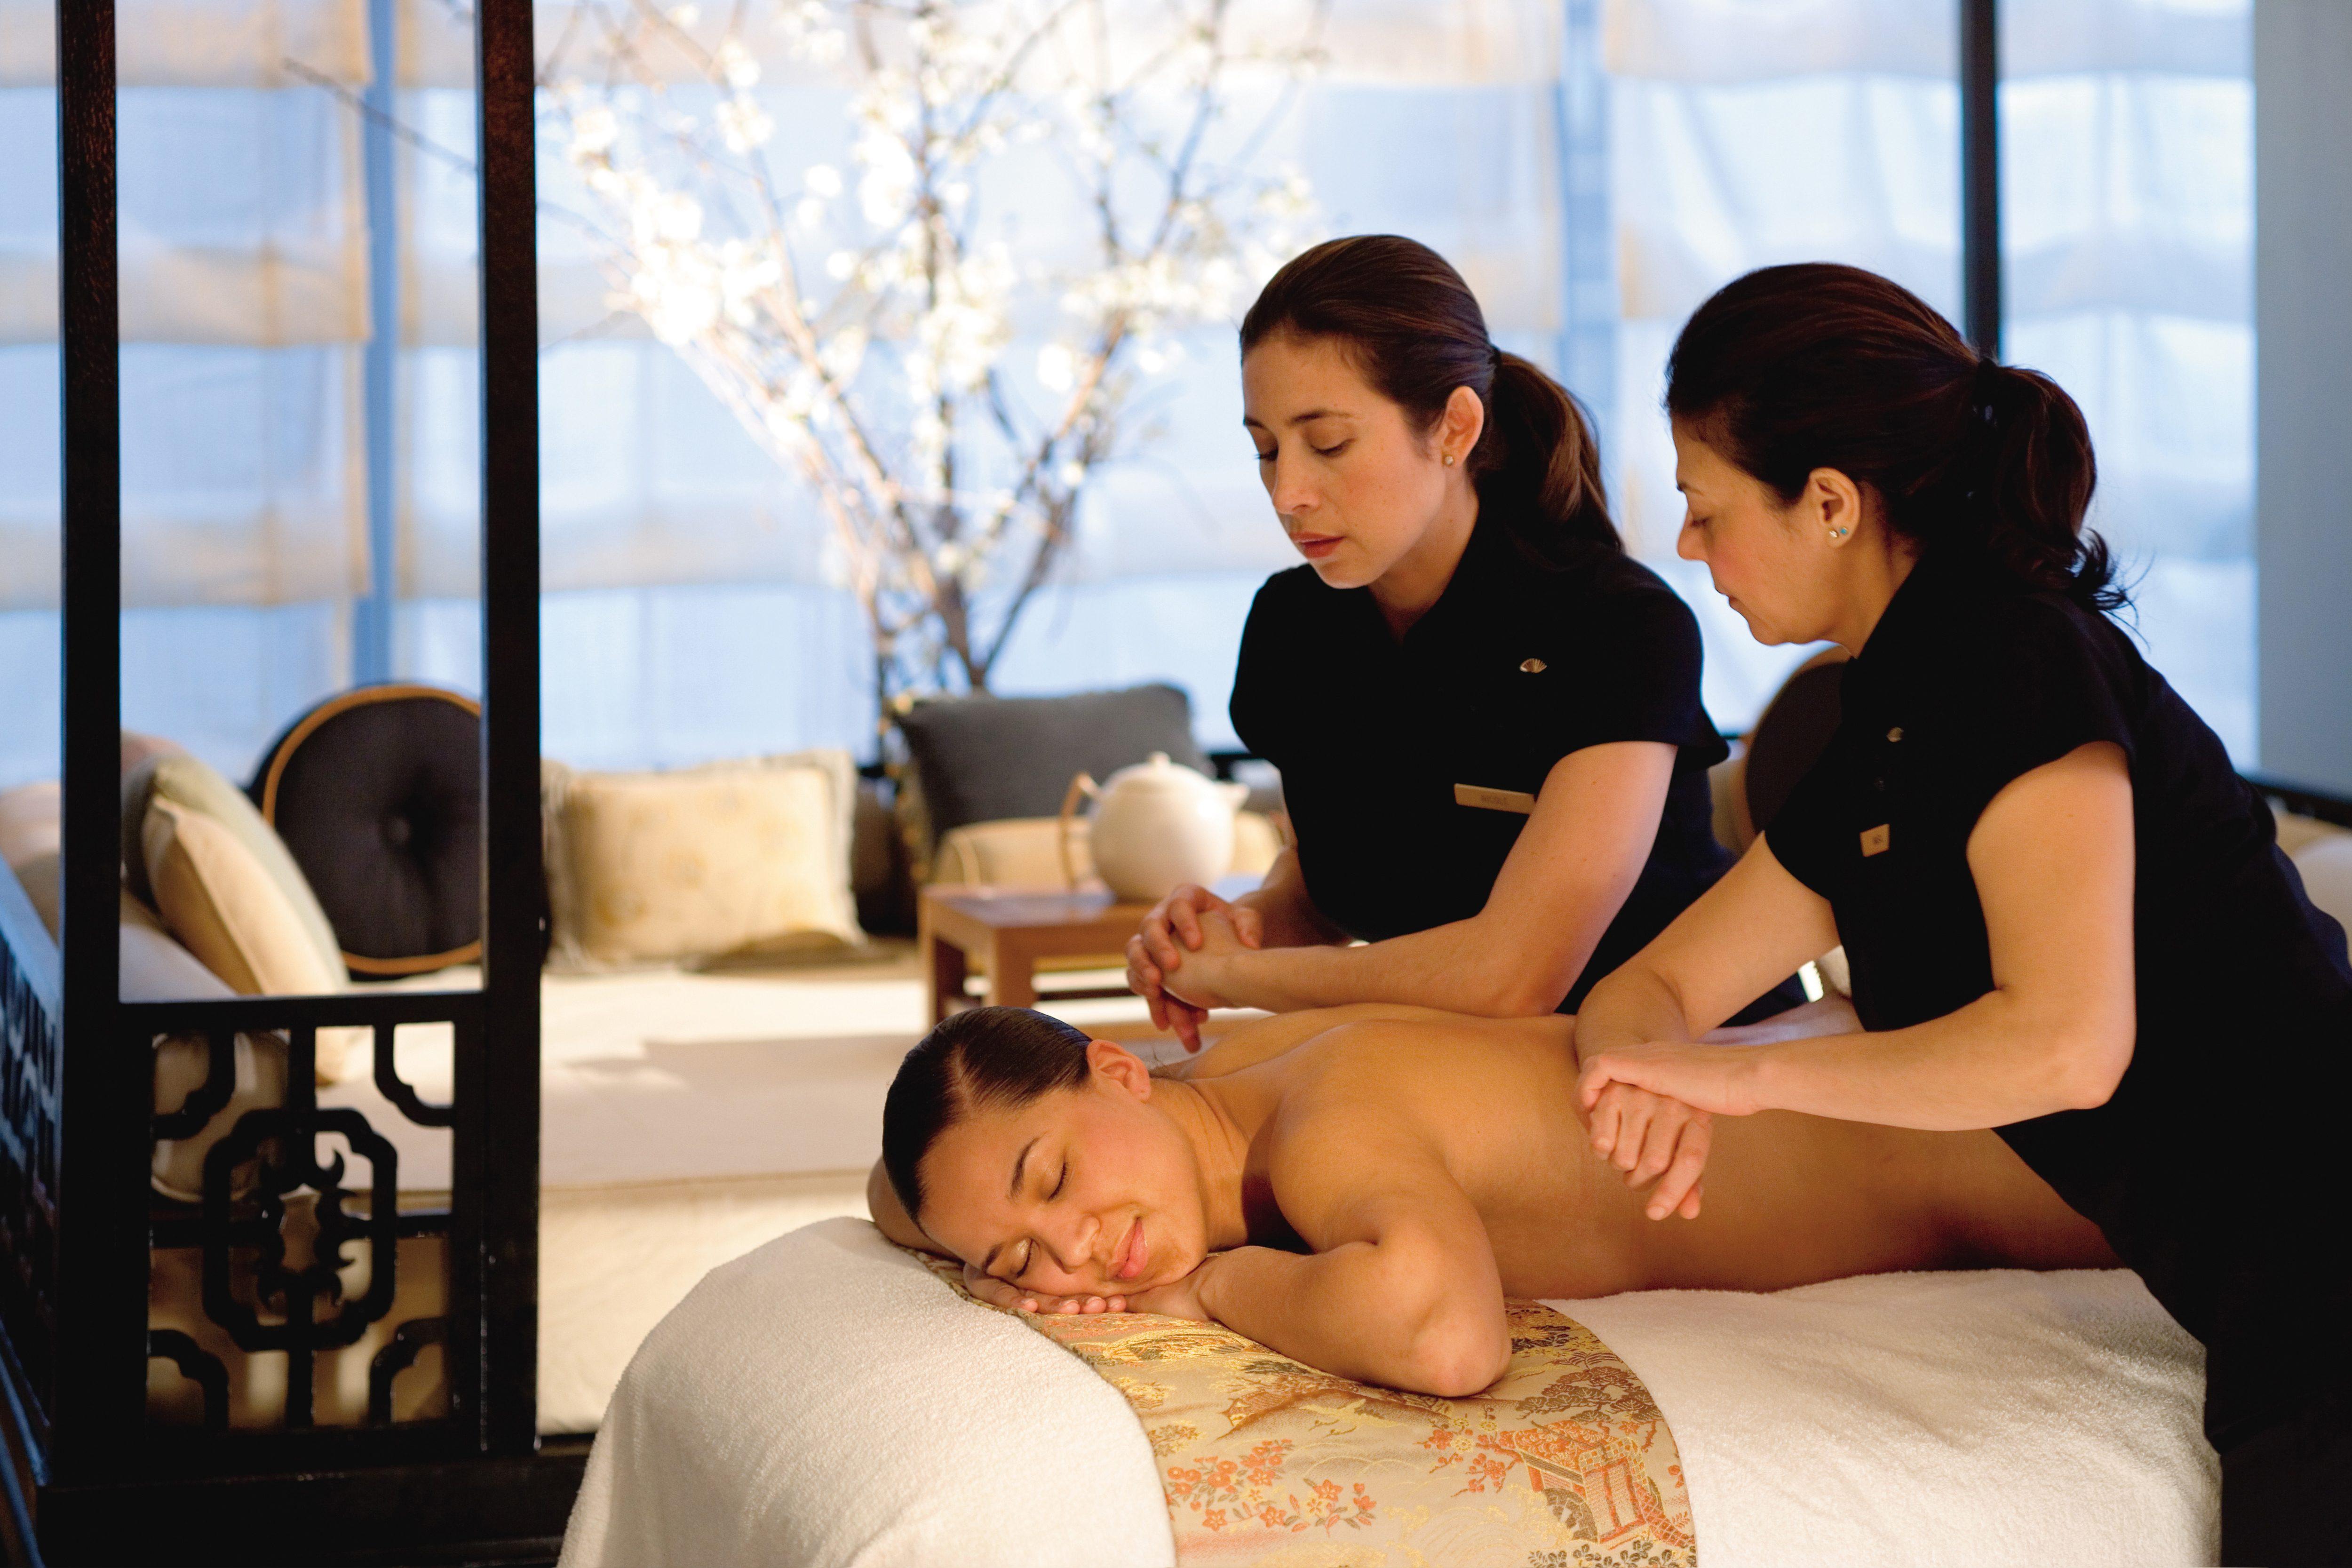 Therapists at Mandarin Oriental performing a massage treatment